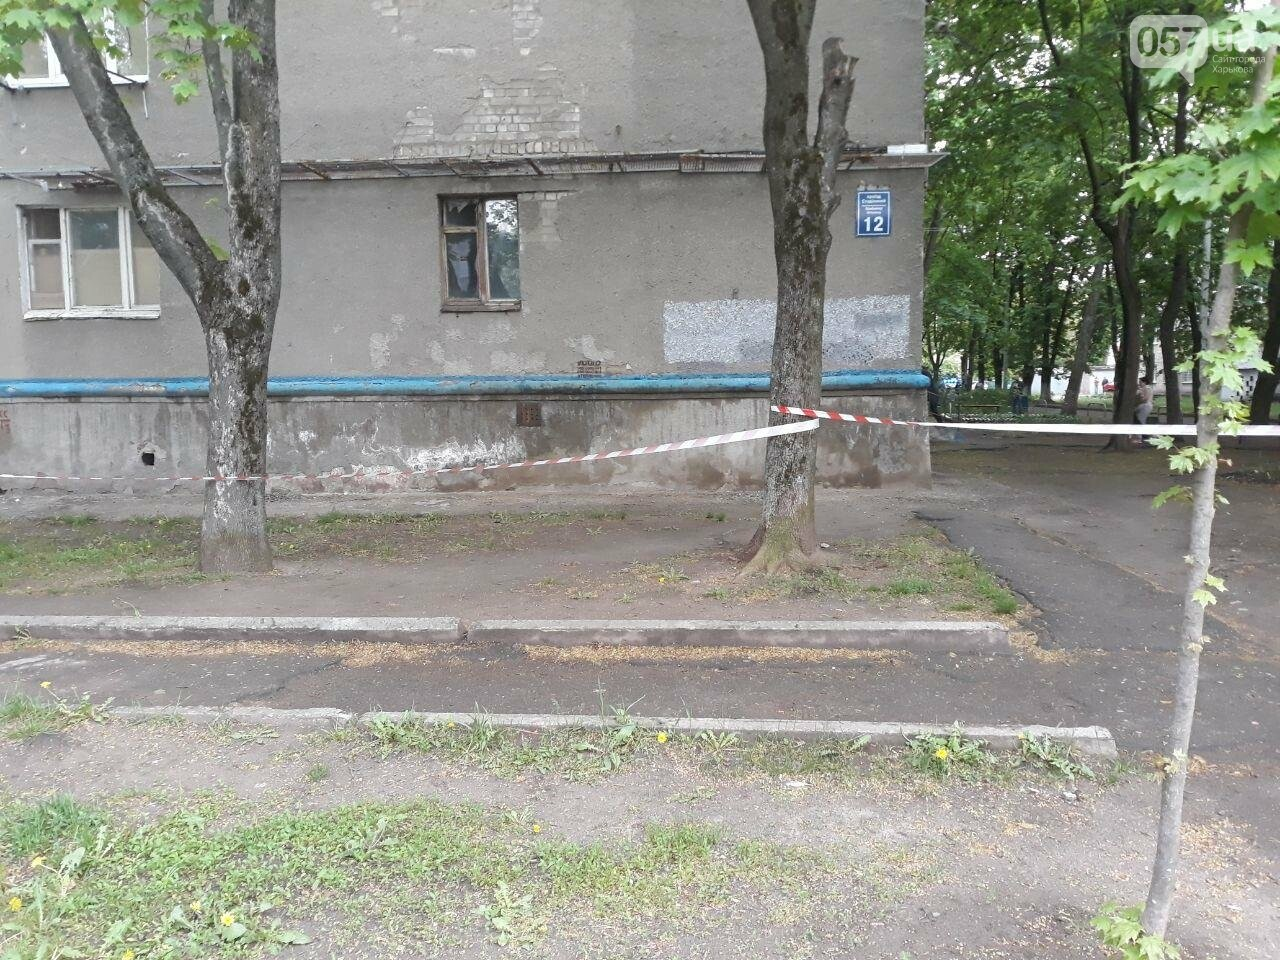 В Харькове силовики оцепили «пятиэтажку» и искали взрывчатку, - ФОТО, фото-1